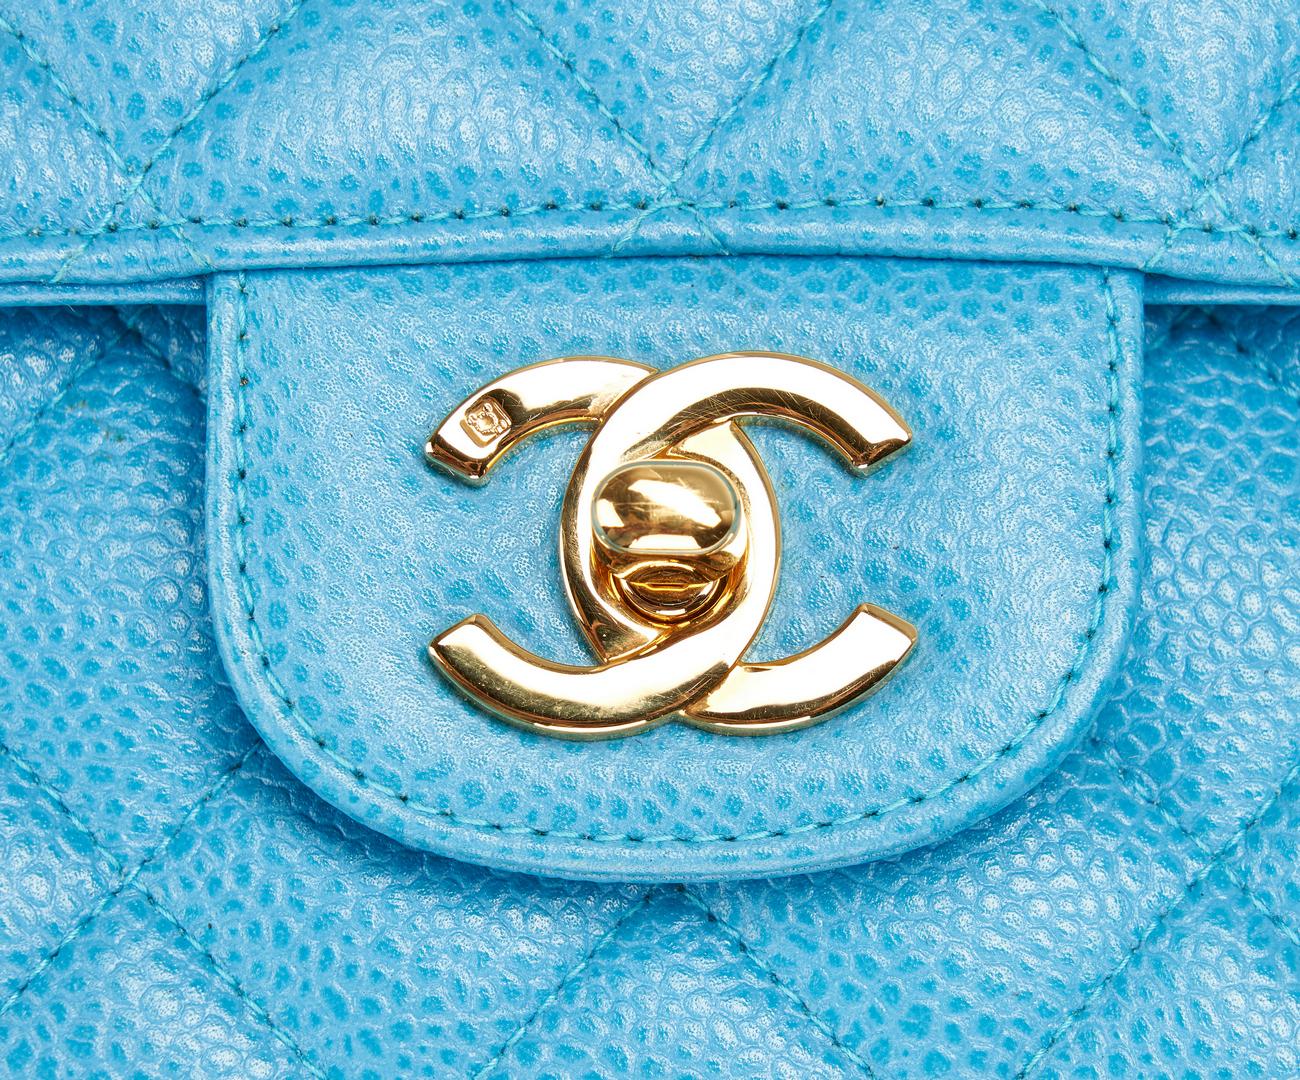 Lot 700: Chanel Kelly Top Handle Turquoise Bag, Medium